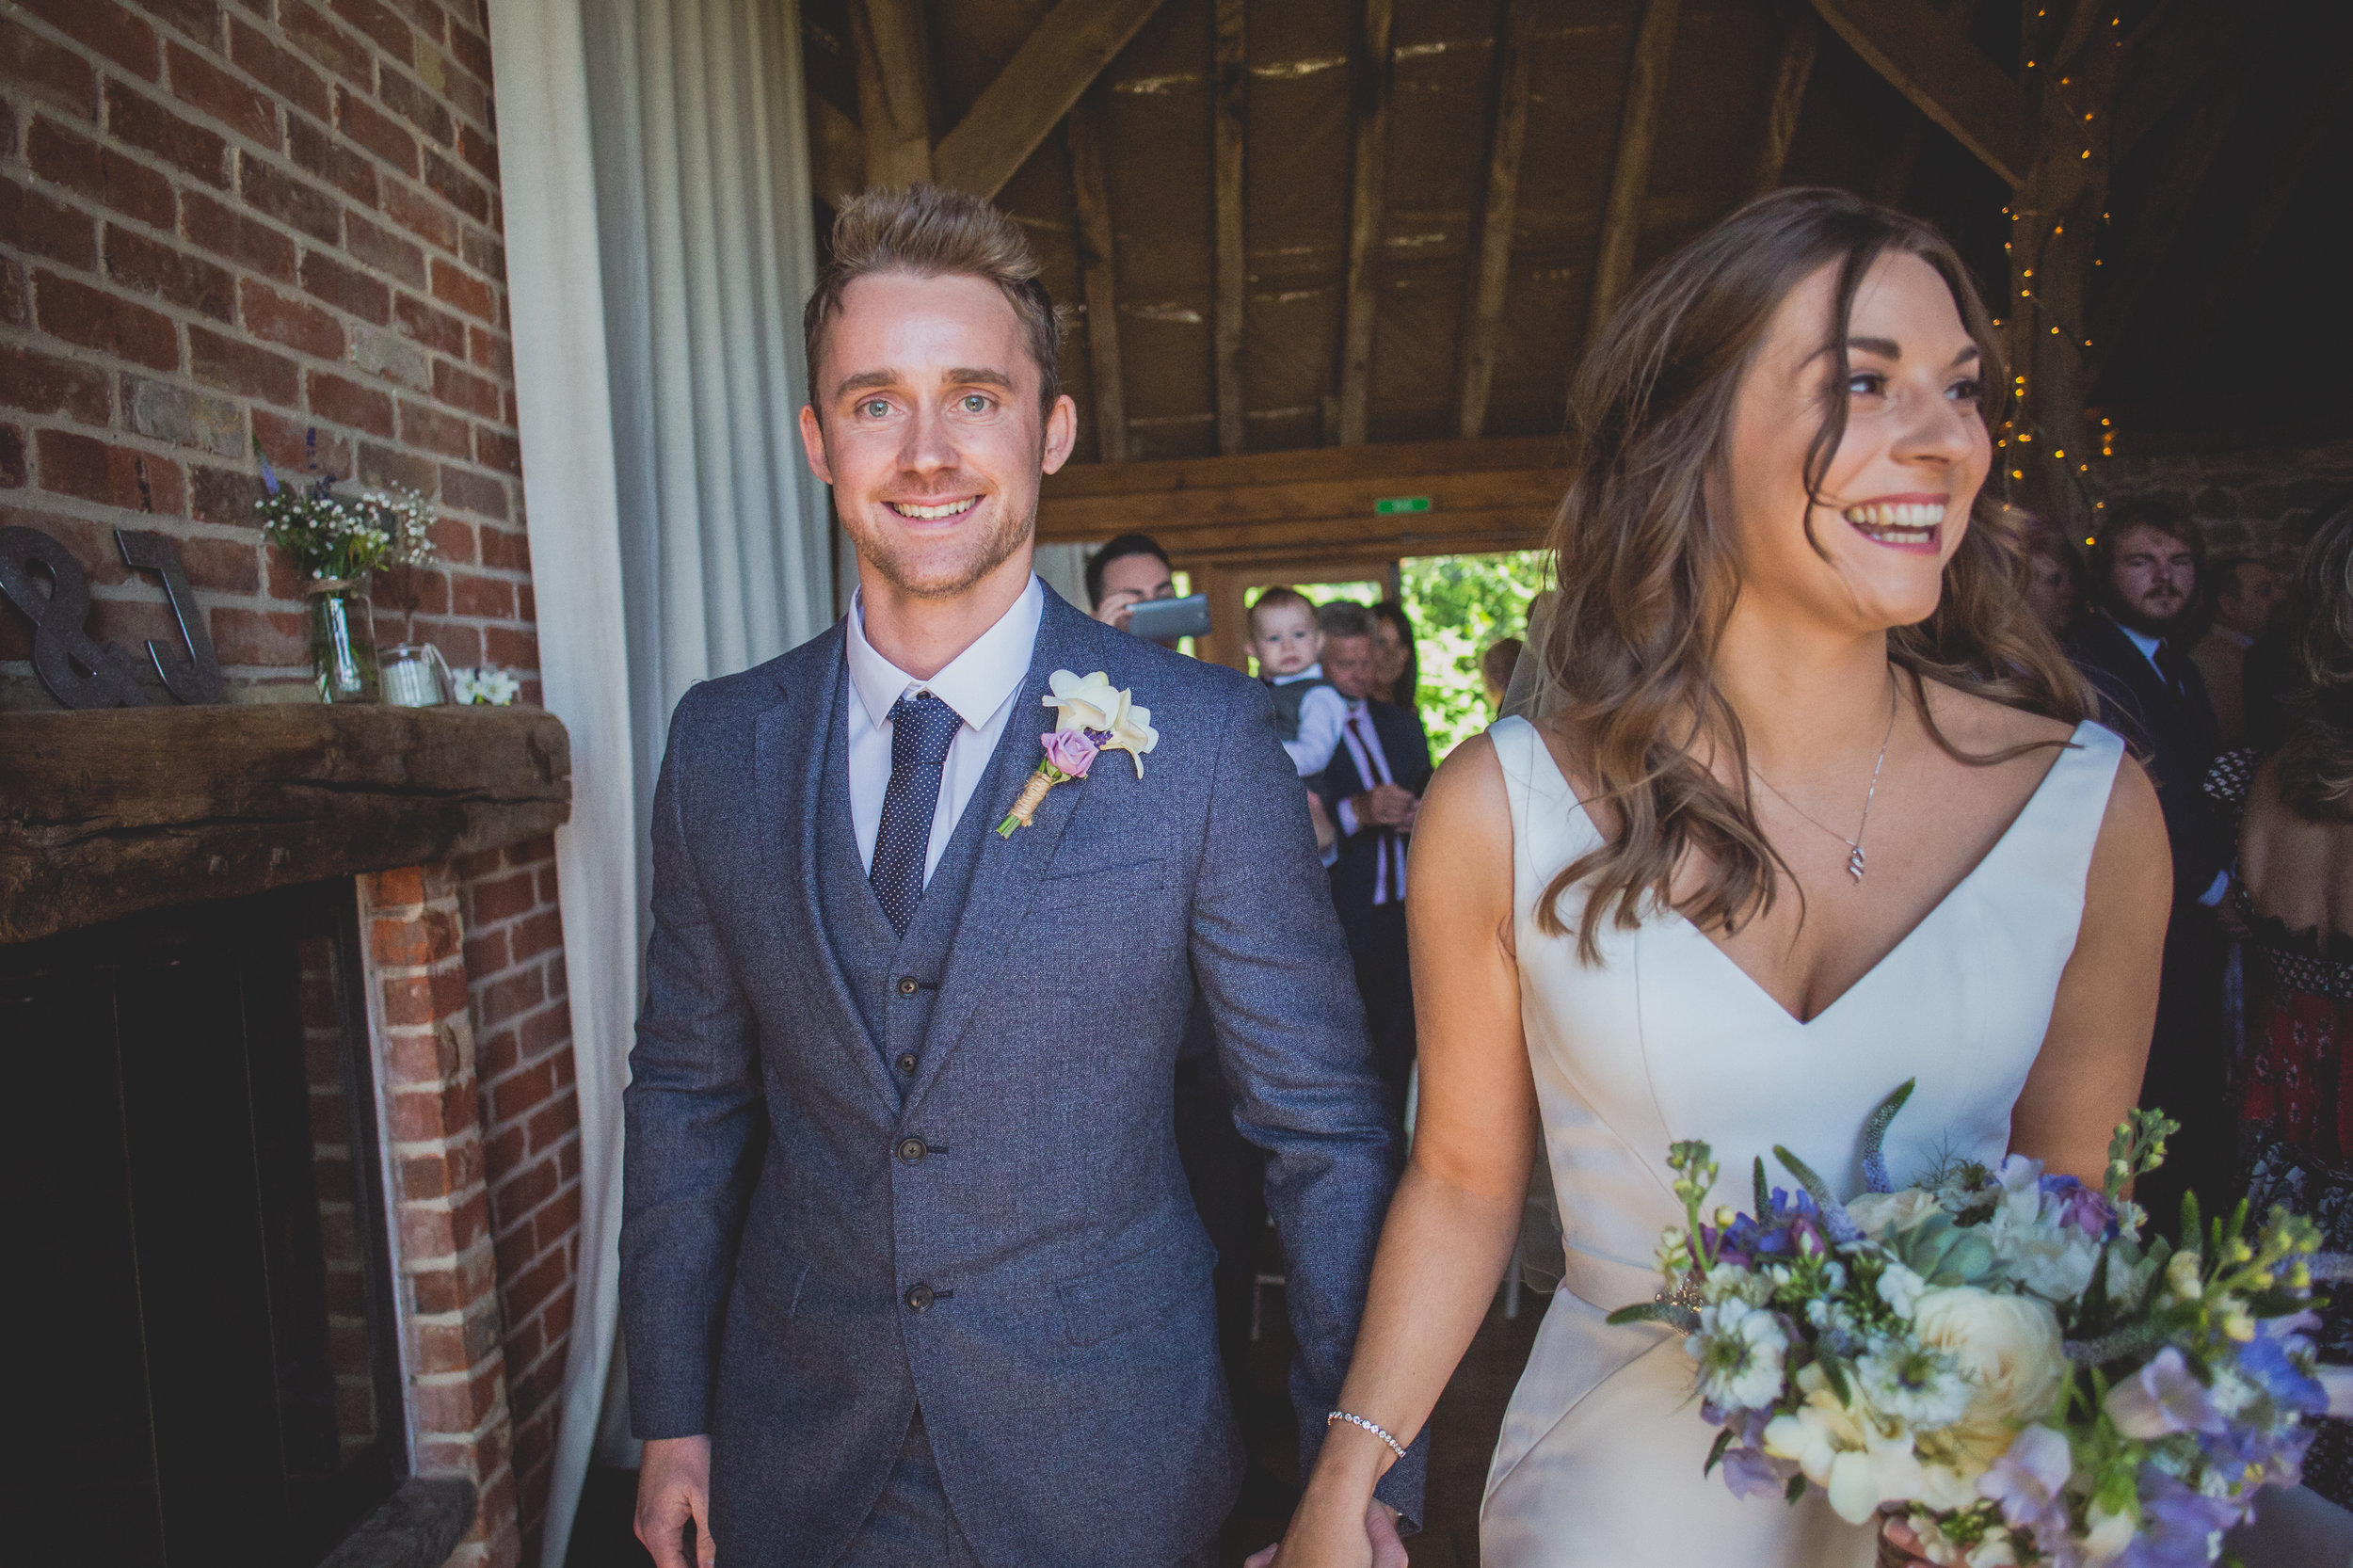 Grittenham Barn female wedding photographers west sussex petworth social-73.jpg